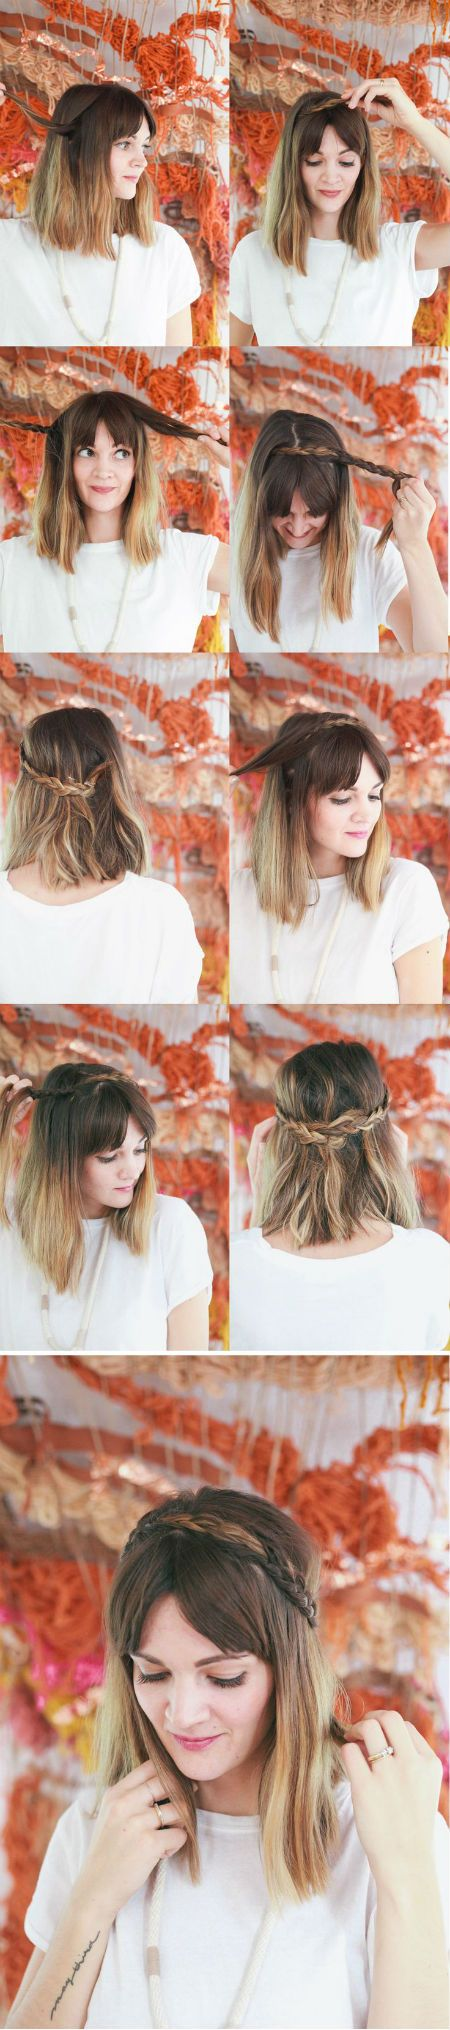 10 Sencillos Peinados Para Cabello Corto